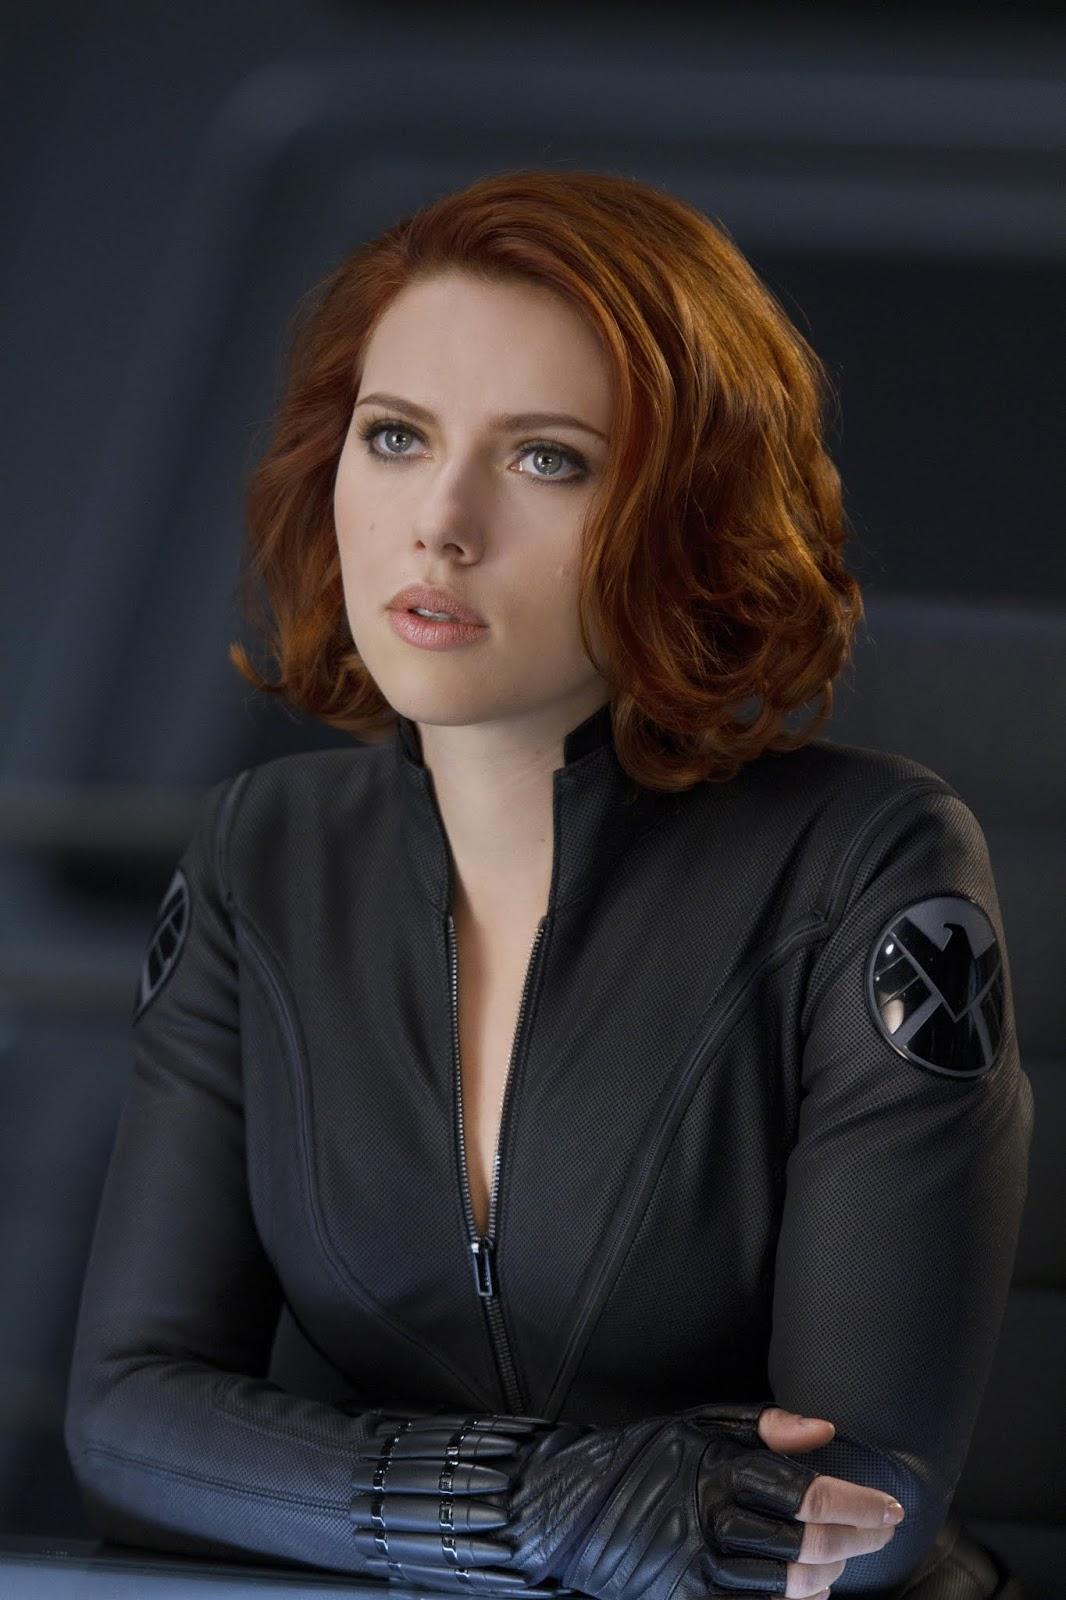 Scarlett Johansson as Black Widow Avengers (2012, Marvel)